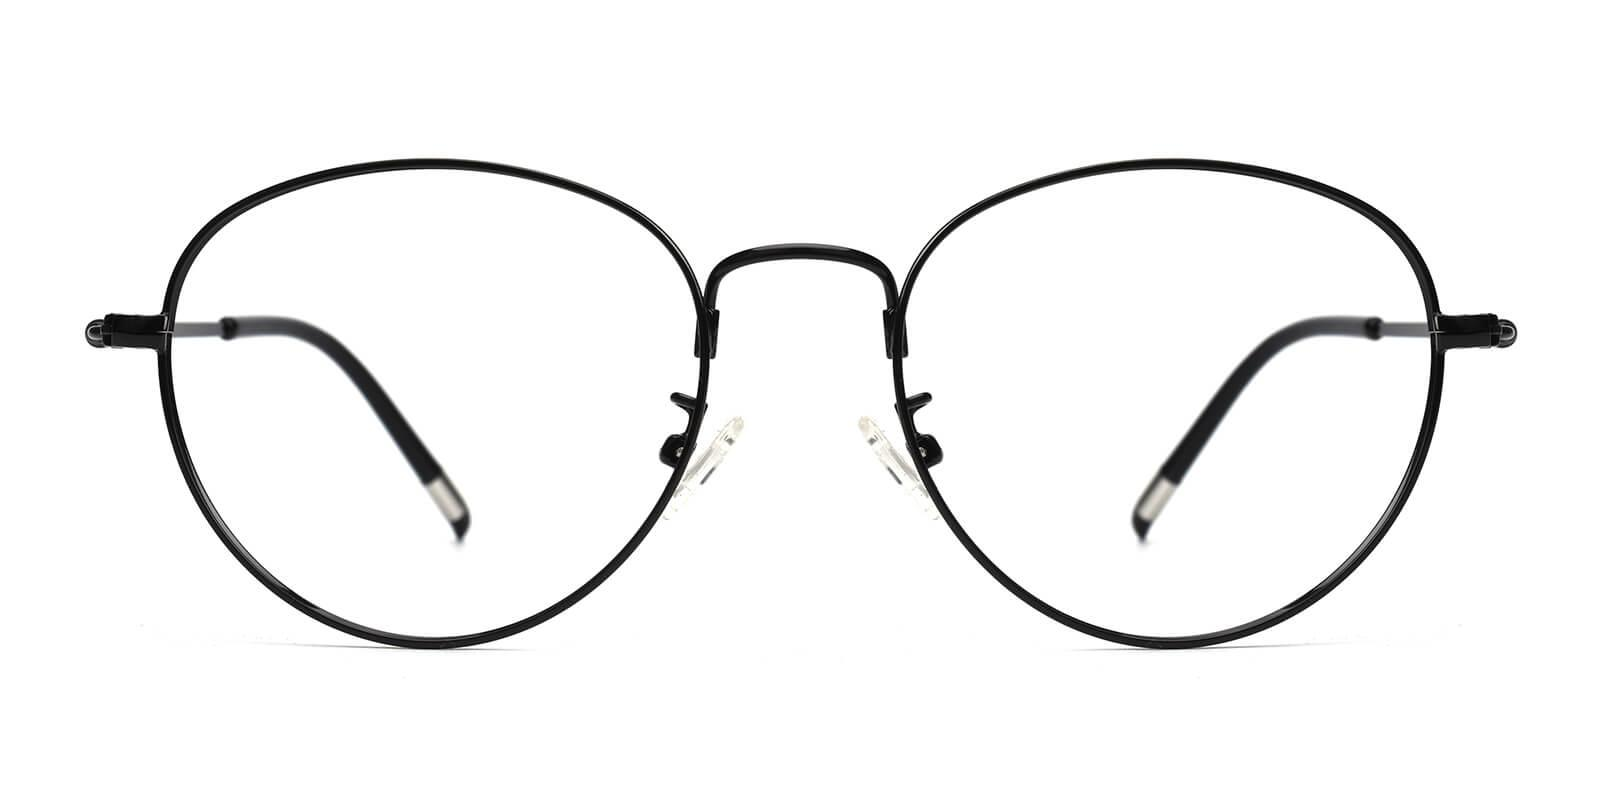 Sadie-Black-Round-Metal-Eyeglasses-additional2